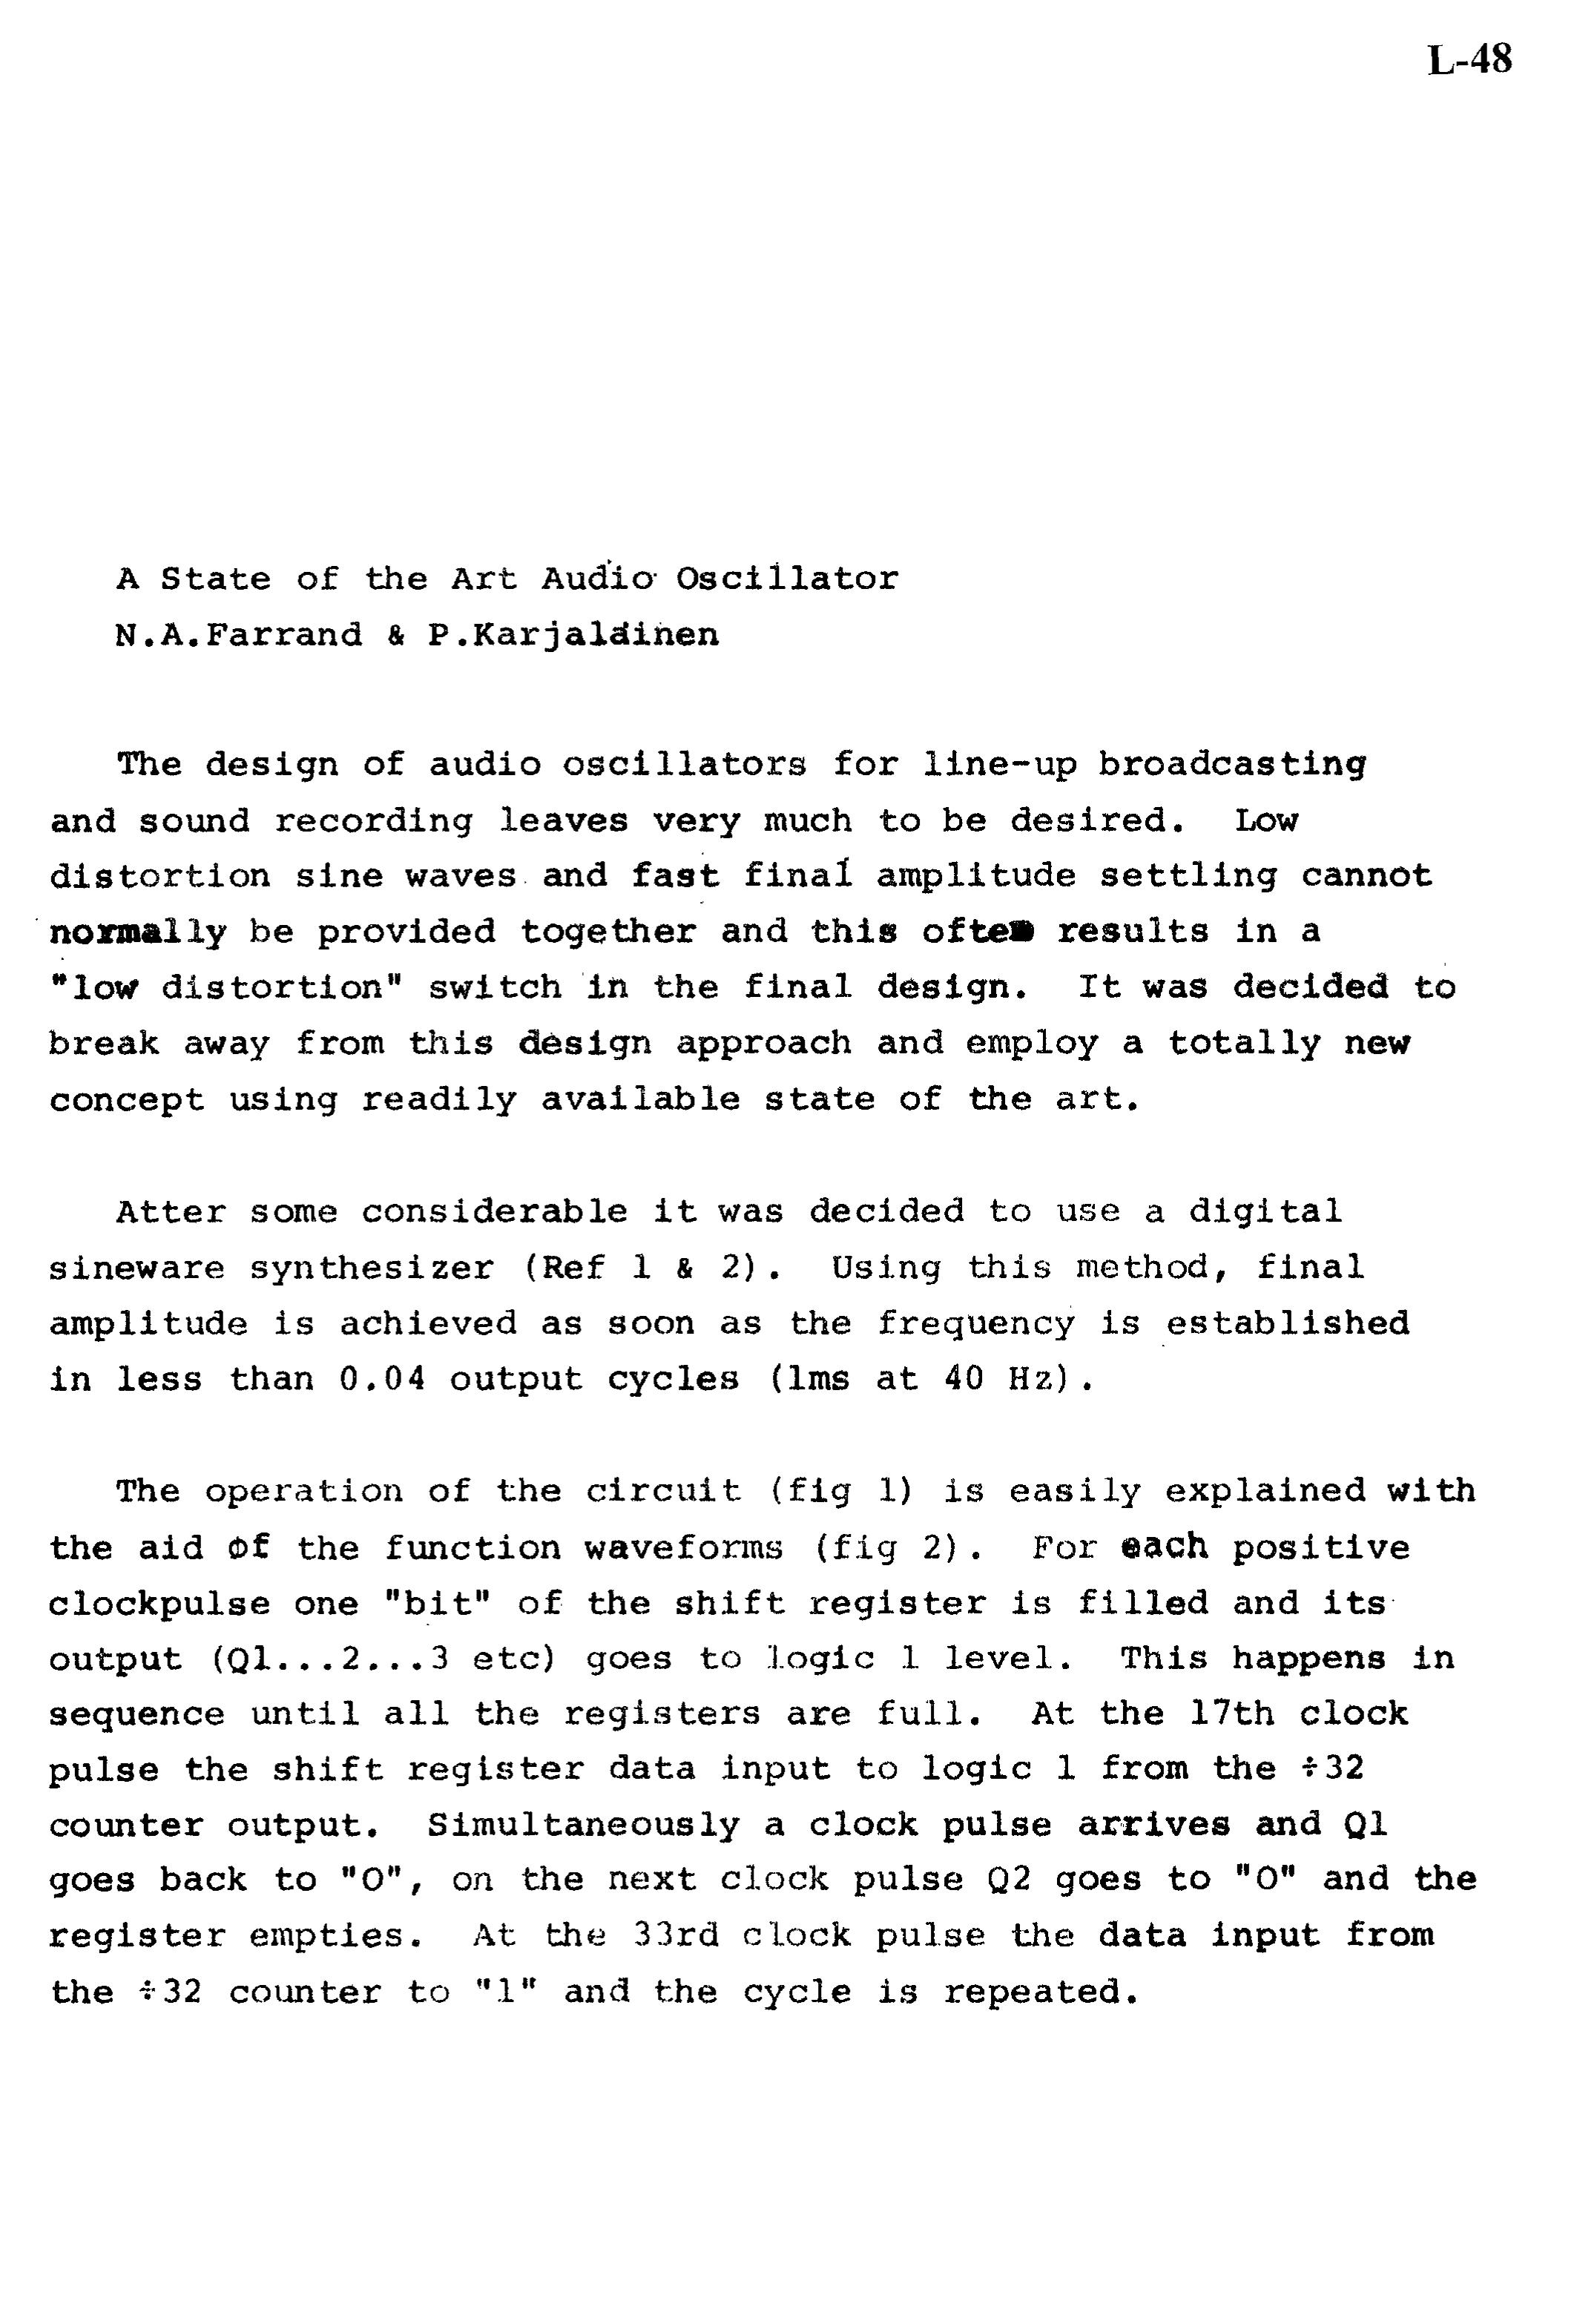 Aes E Library A State Of The Art Audio Oscillator Oscillators